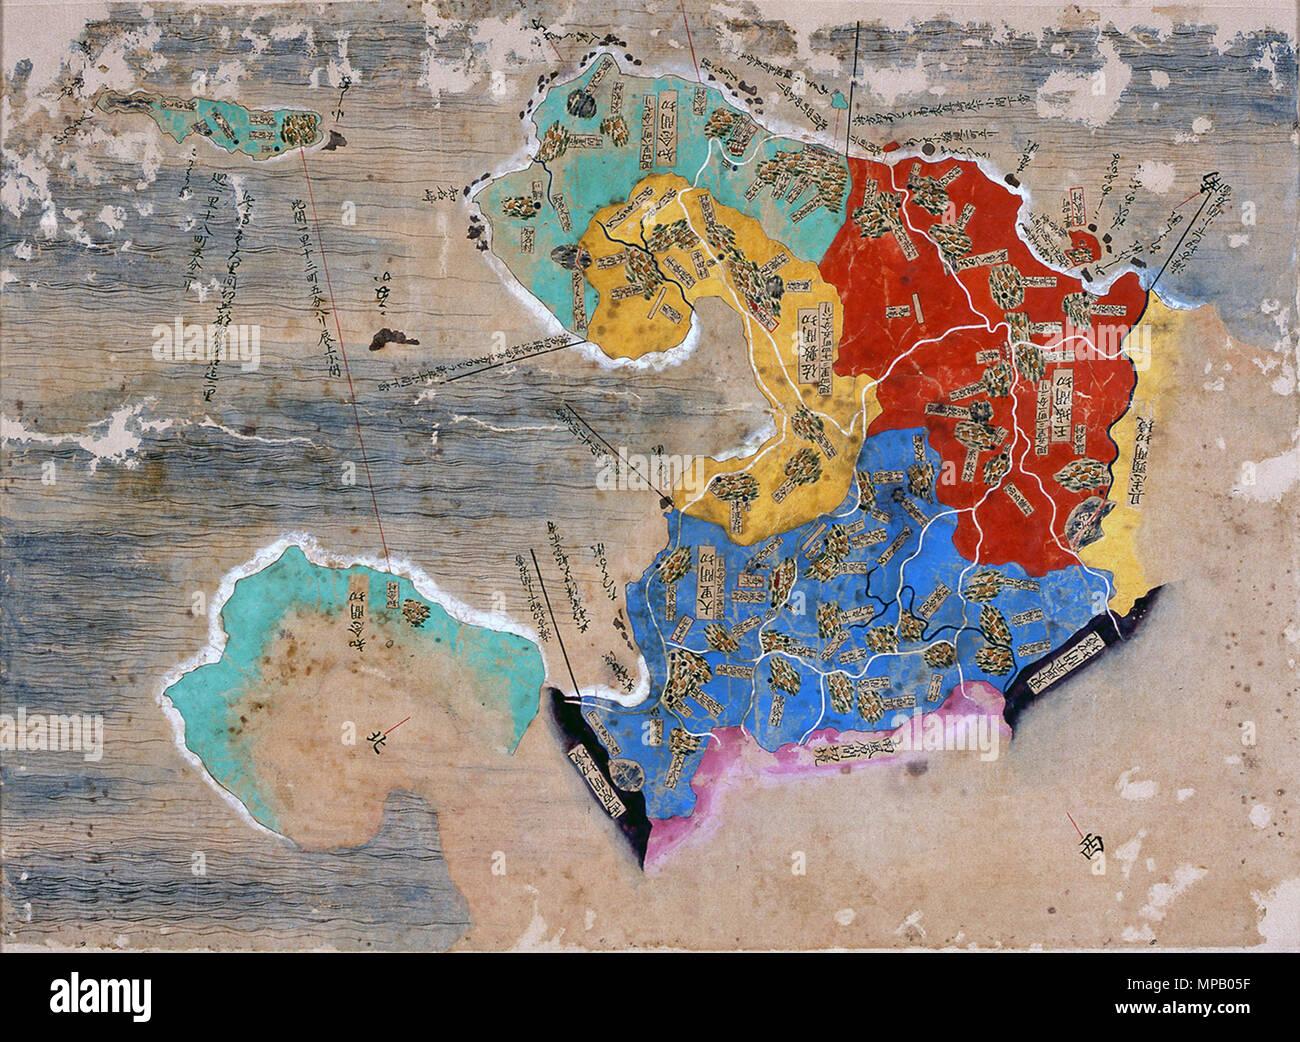 . English: Map of Chinen Magiri etc, Okinawa Prefectural Museum & Art Museum, Naha, Okinawa, Japan 日本語: 間切図 知念間切など . C18. unknown C18 cartographer 851 Map of Chinen Magiri (Okinawa Prefectural Museum & Art Museum) - Stock Image